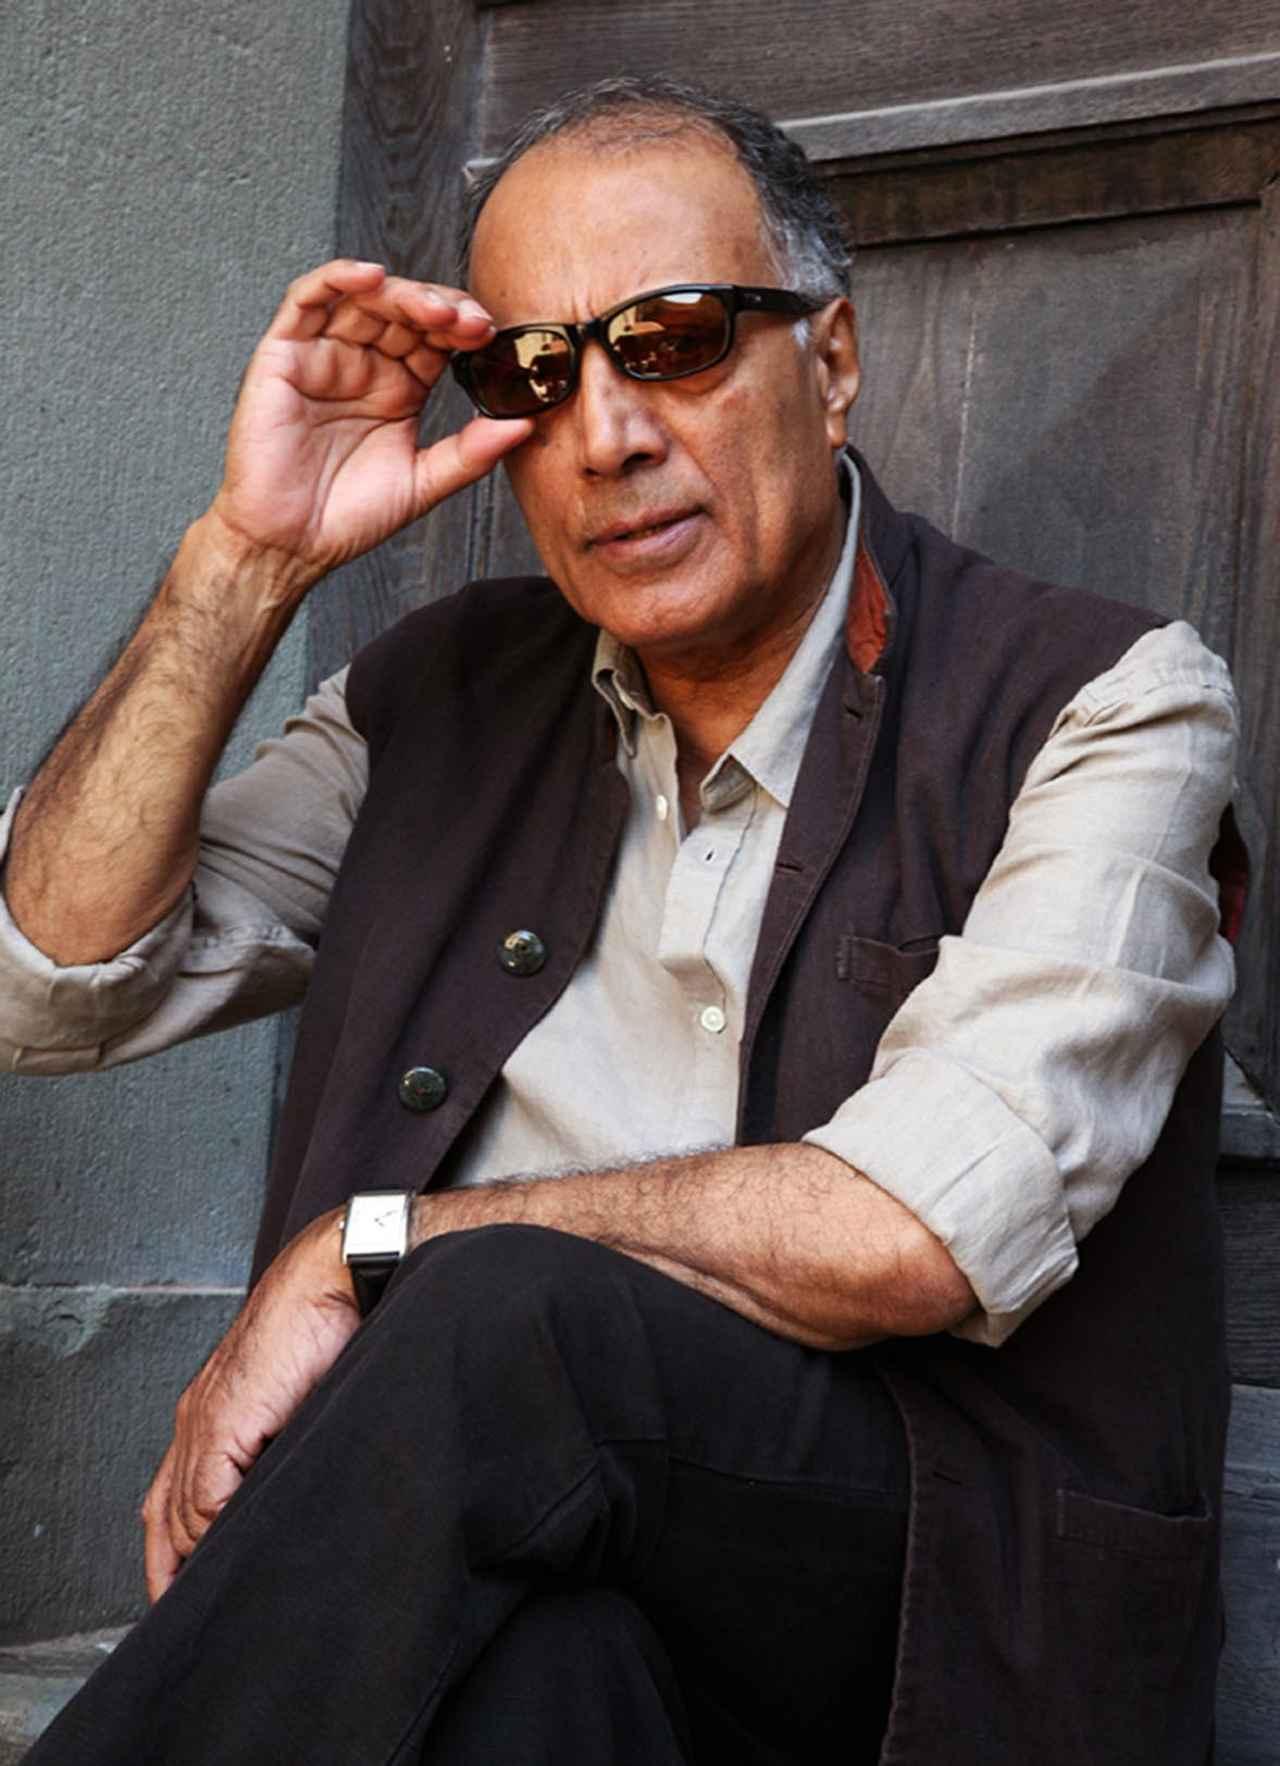 画像: http://www.eurospace.co.jp/works/detail.php?w_id=000136 Abbas Kiarostami by Hamideh Razavi